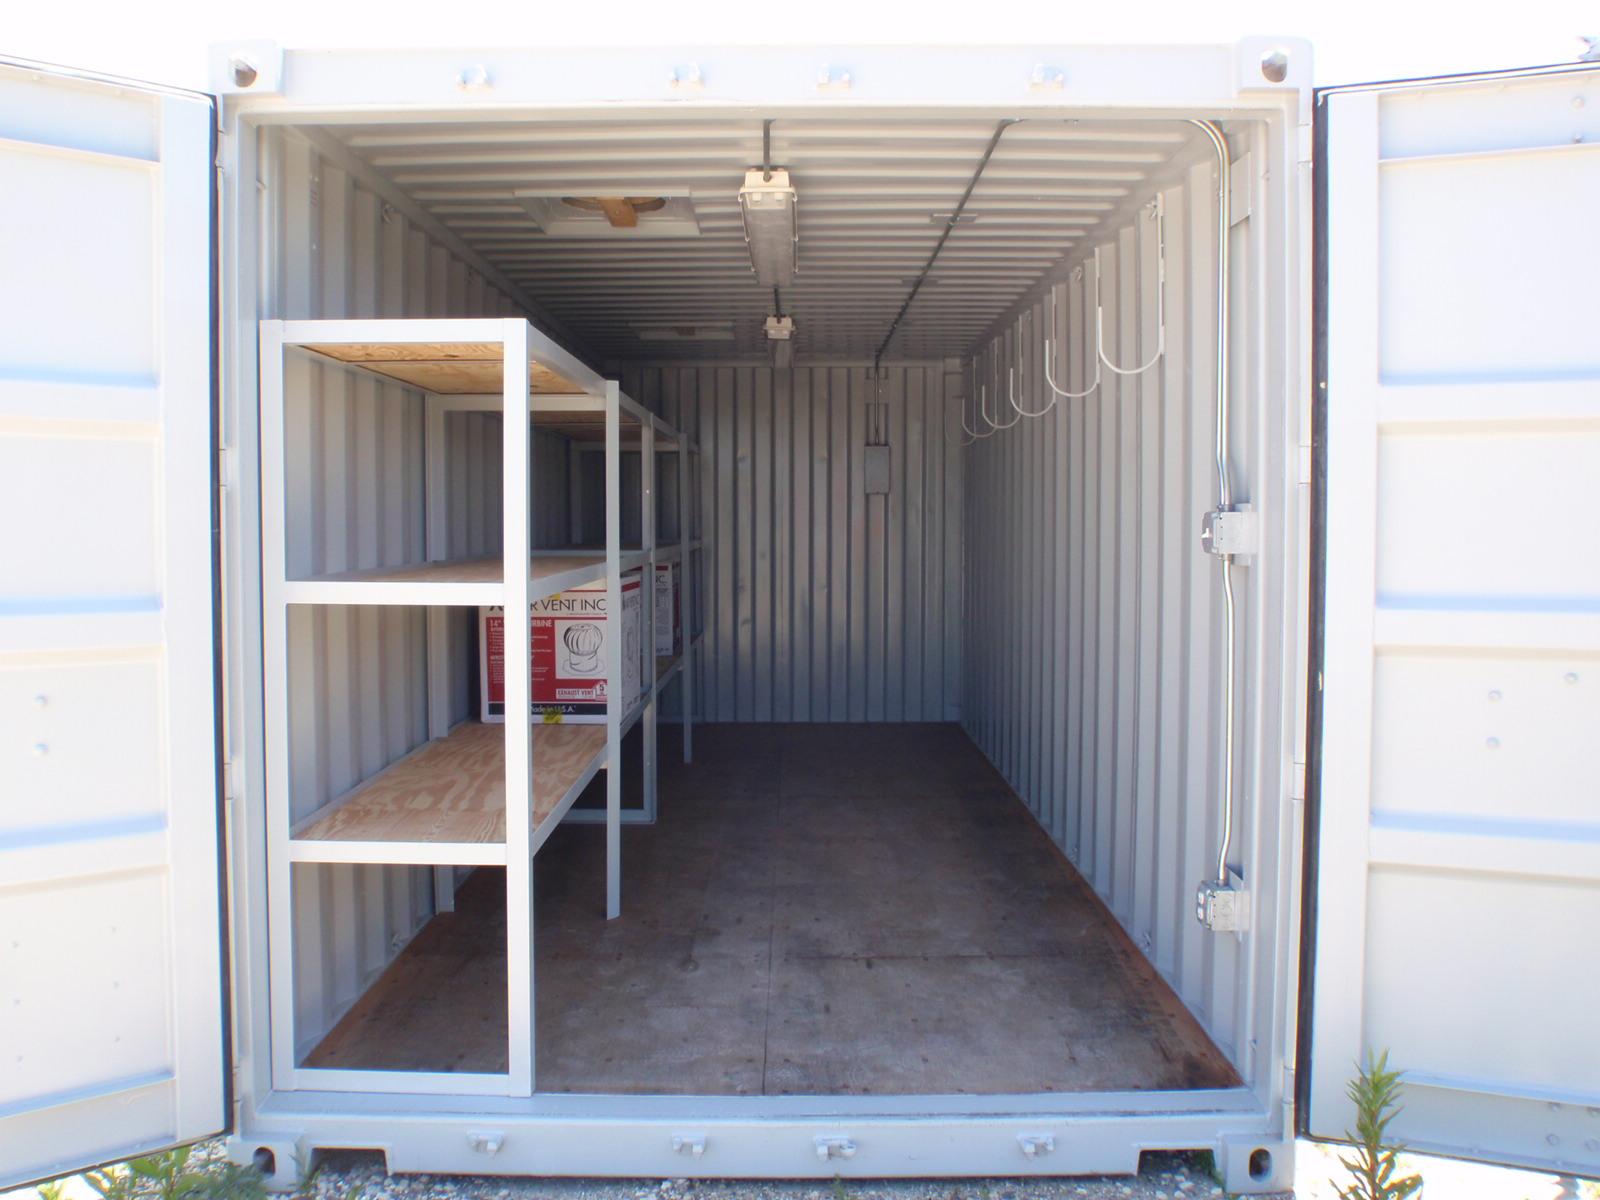 Louisiana Container Sales Inc. image 2